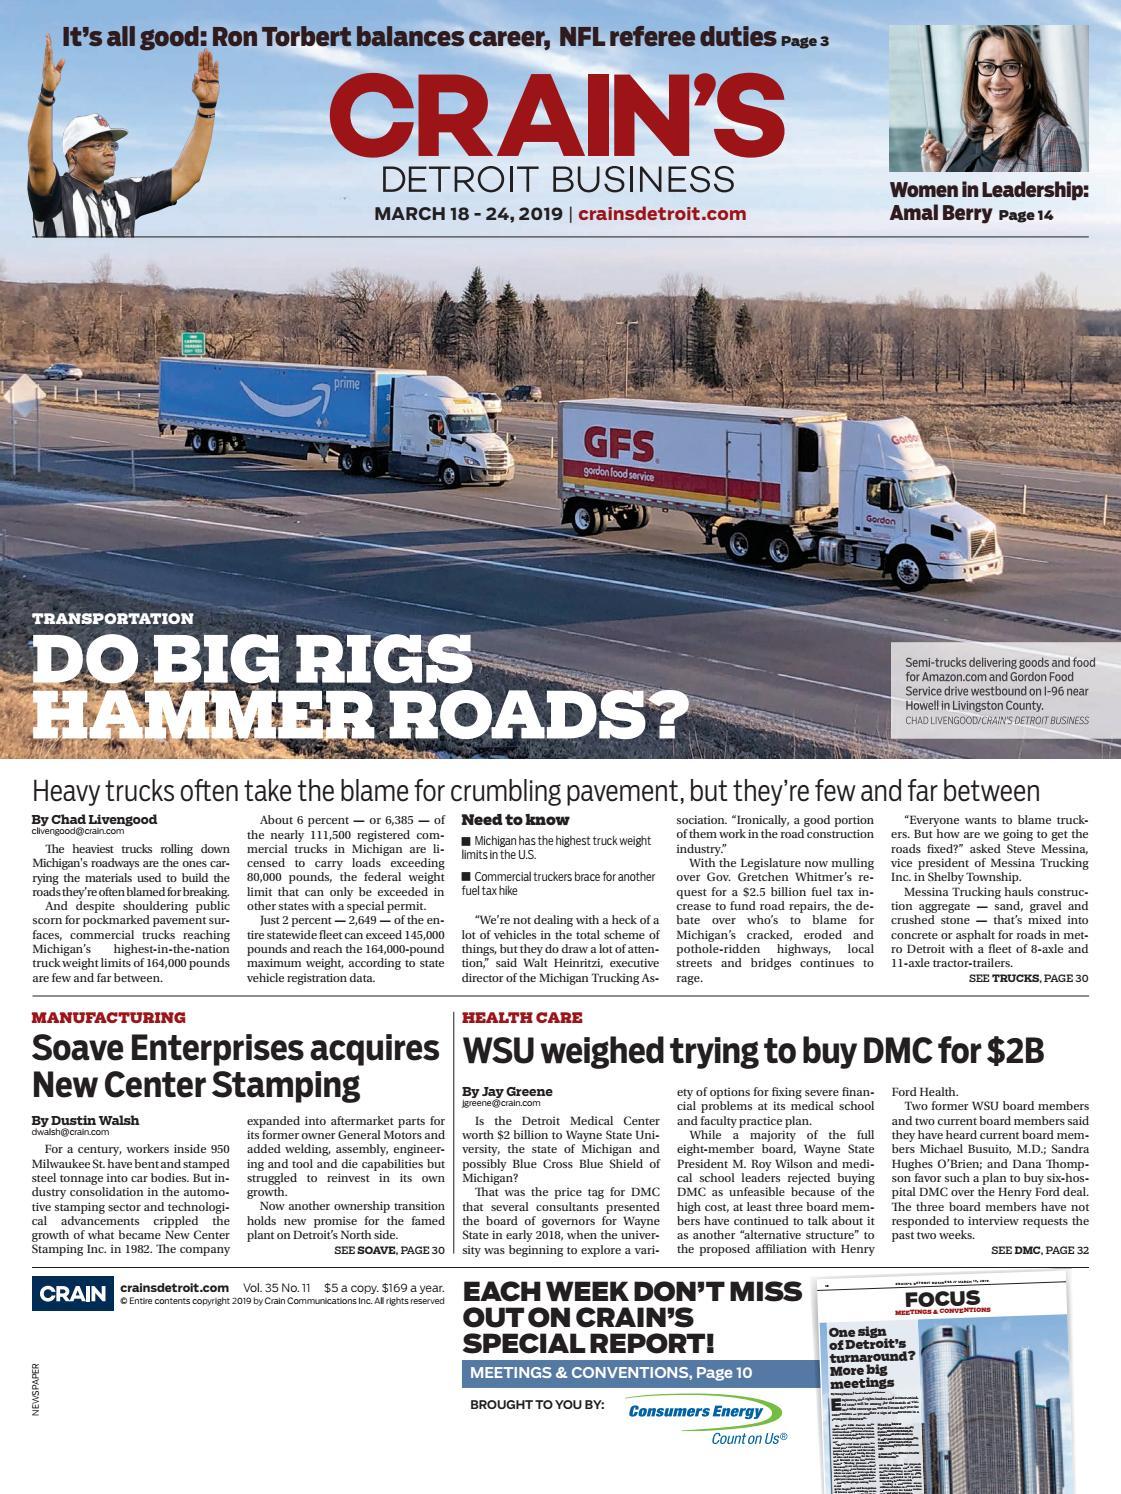 Crain's Detroit Business, March 18, 2019 issue by Crain's Detroit